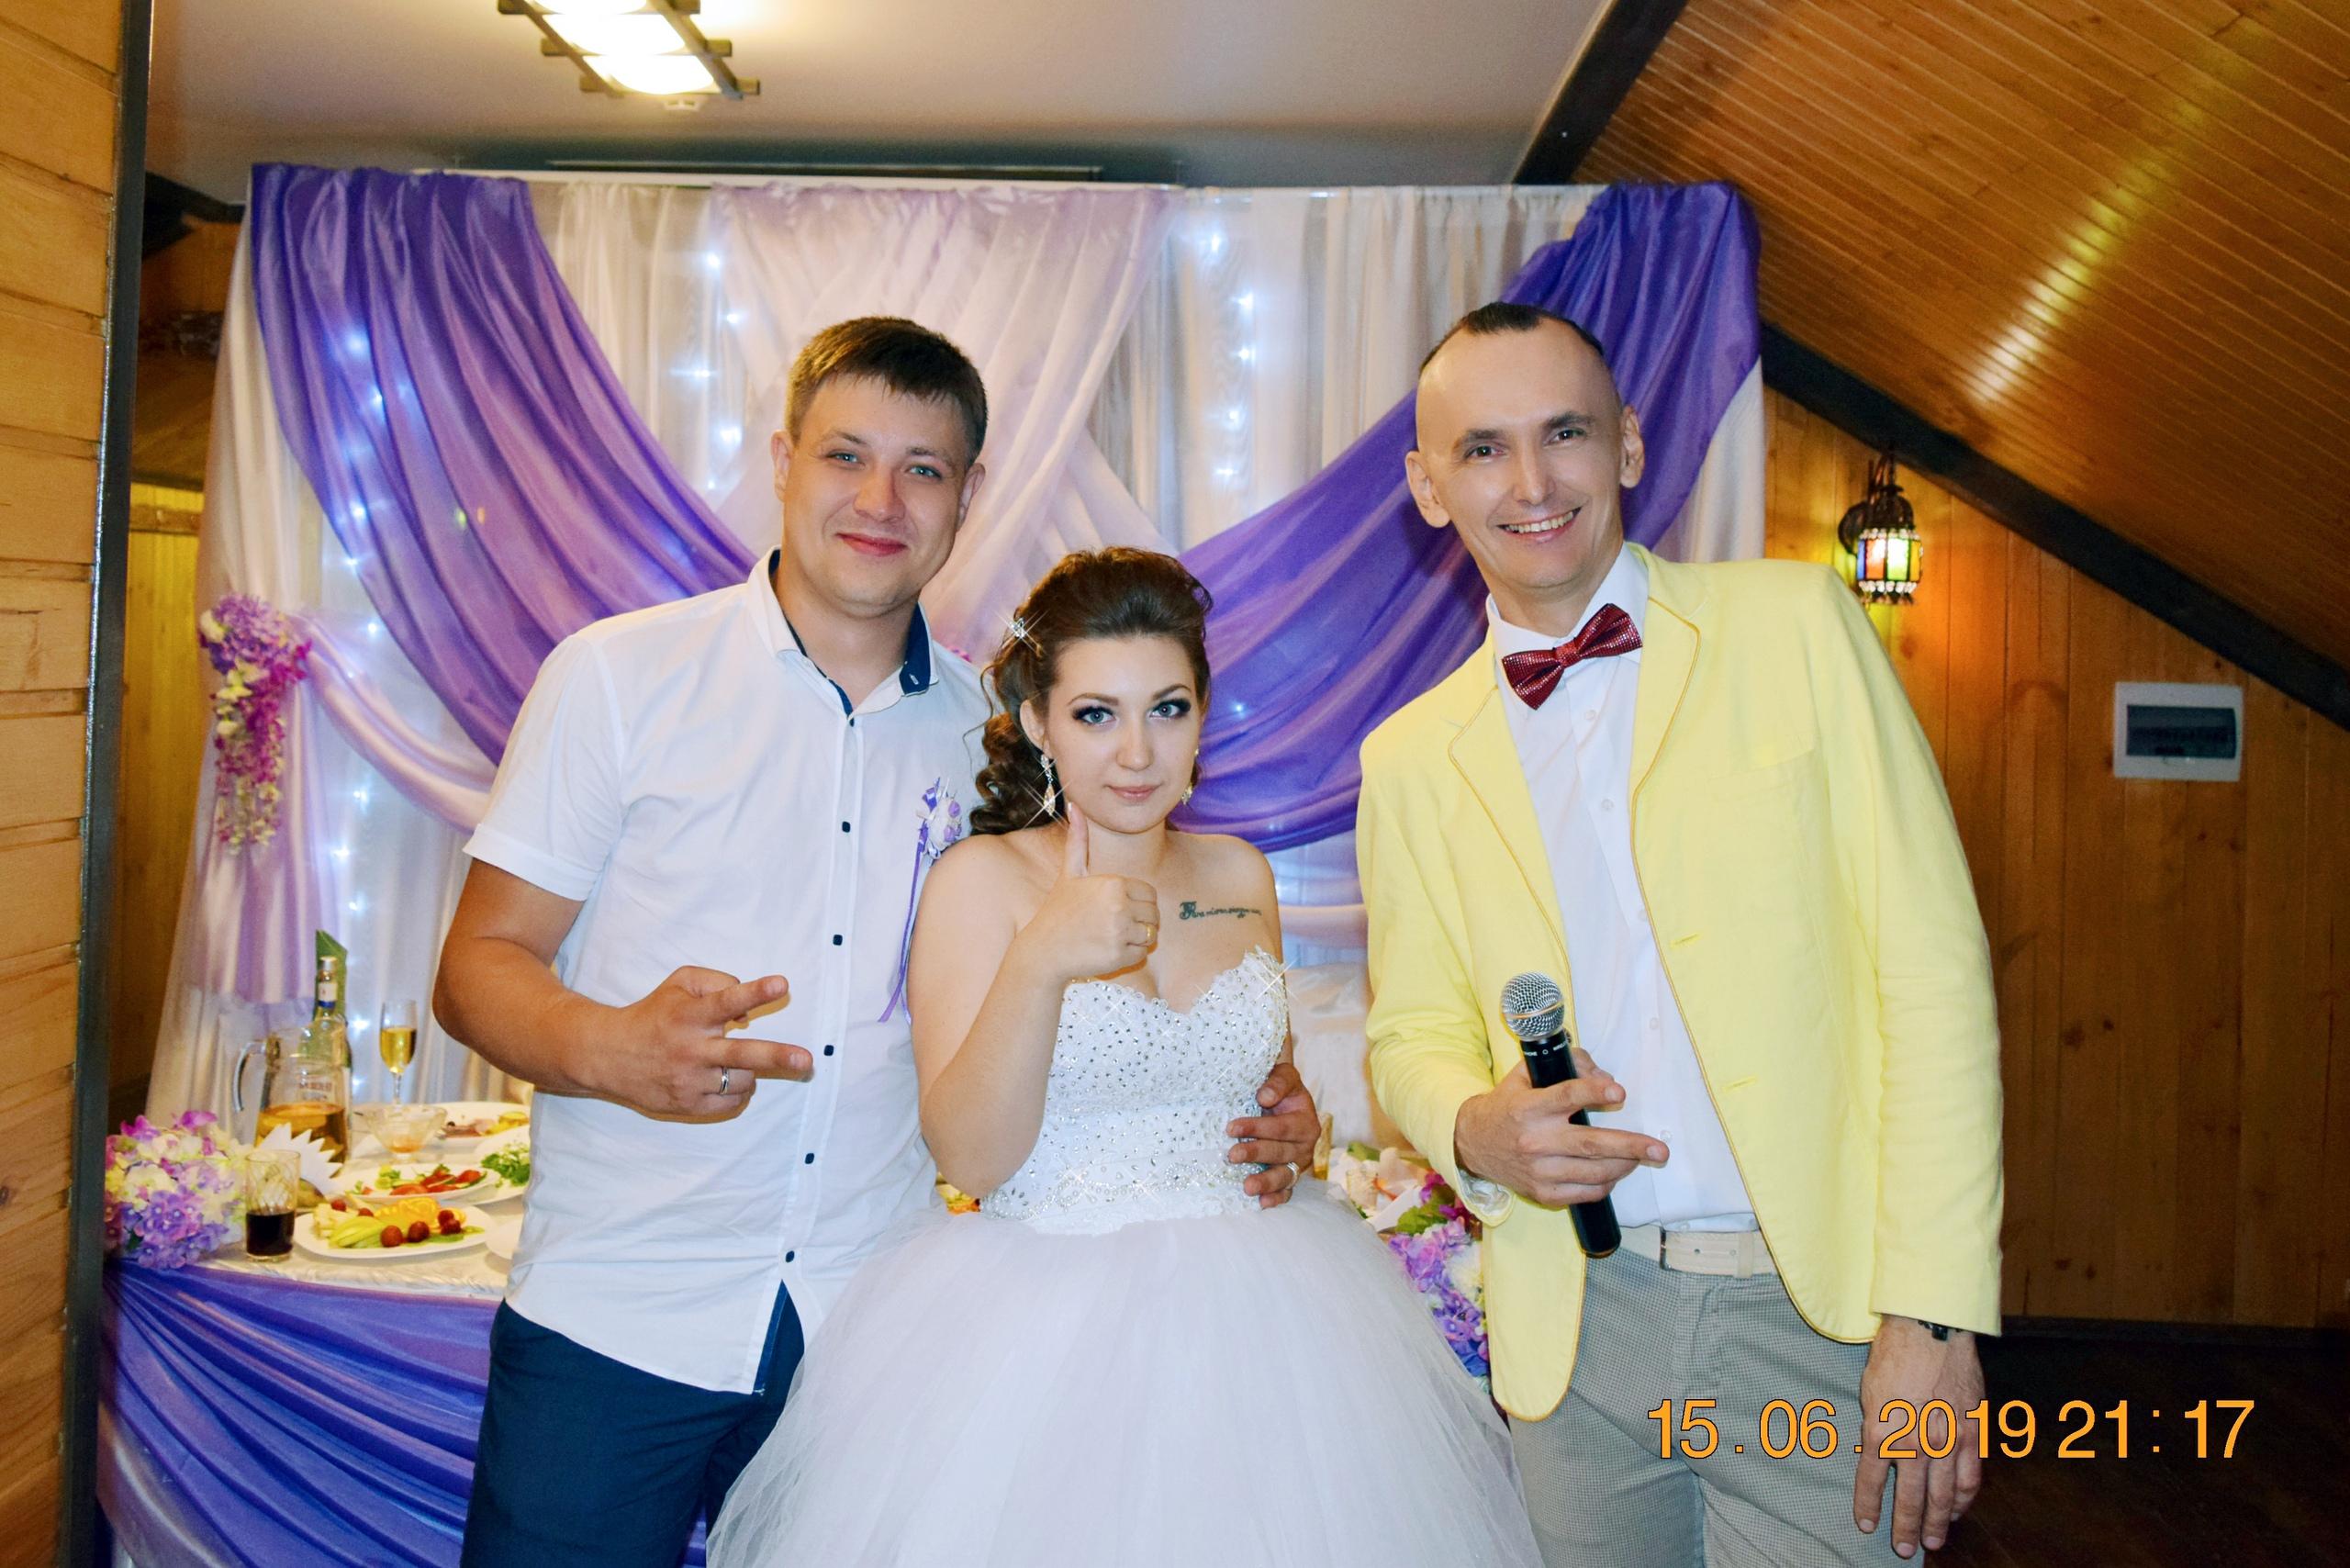 urtJpJPkpbM - Свадьба Максима и Дарьи